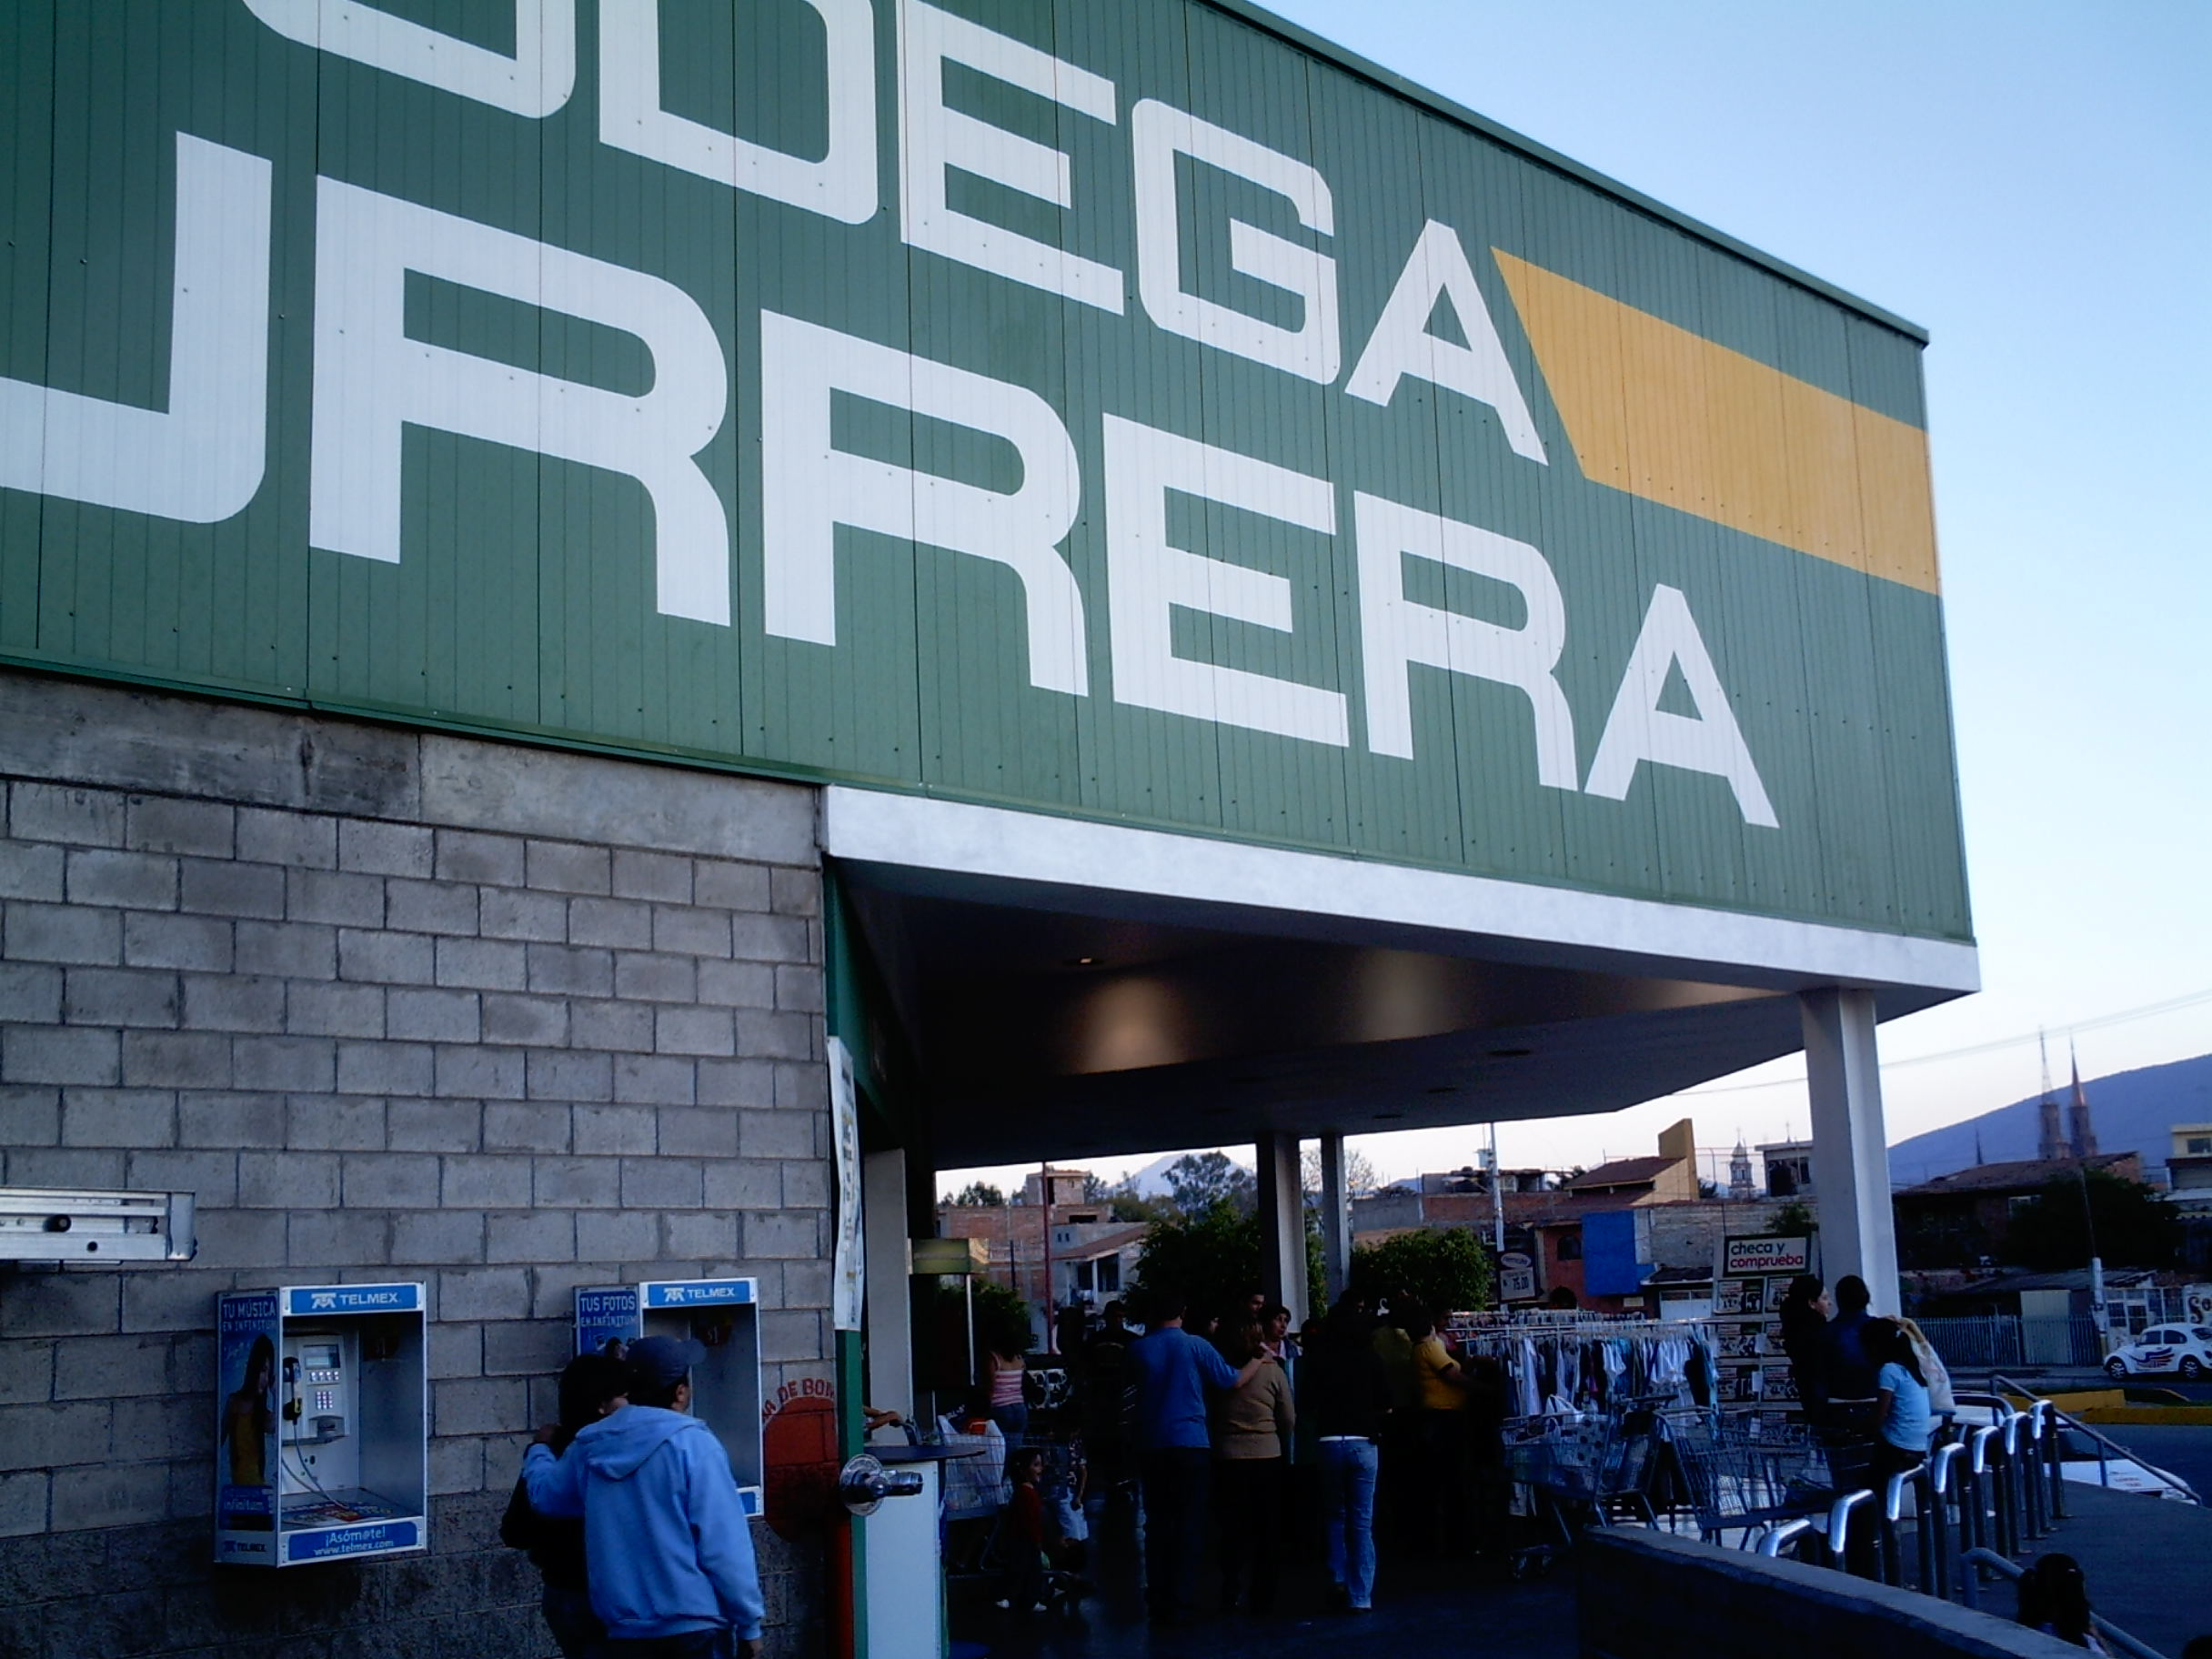 0818ef617 Bodega Aurrerá - Wikipedia